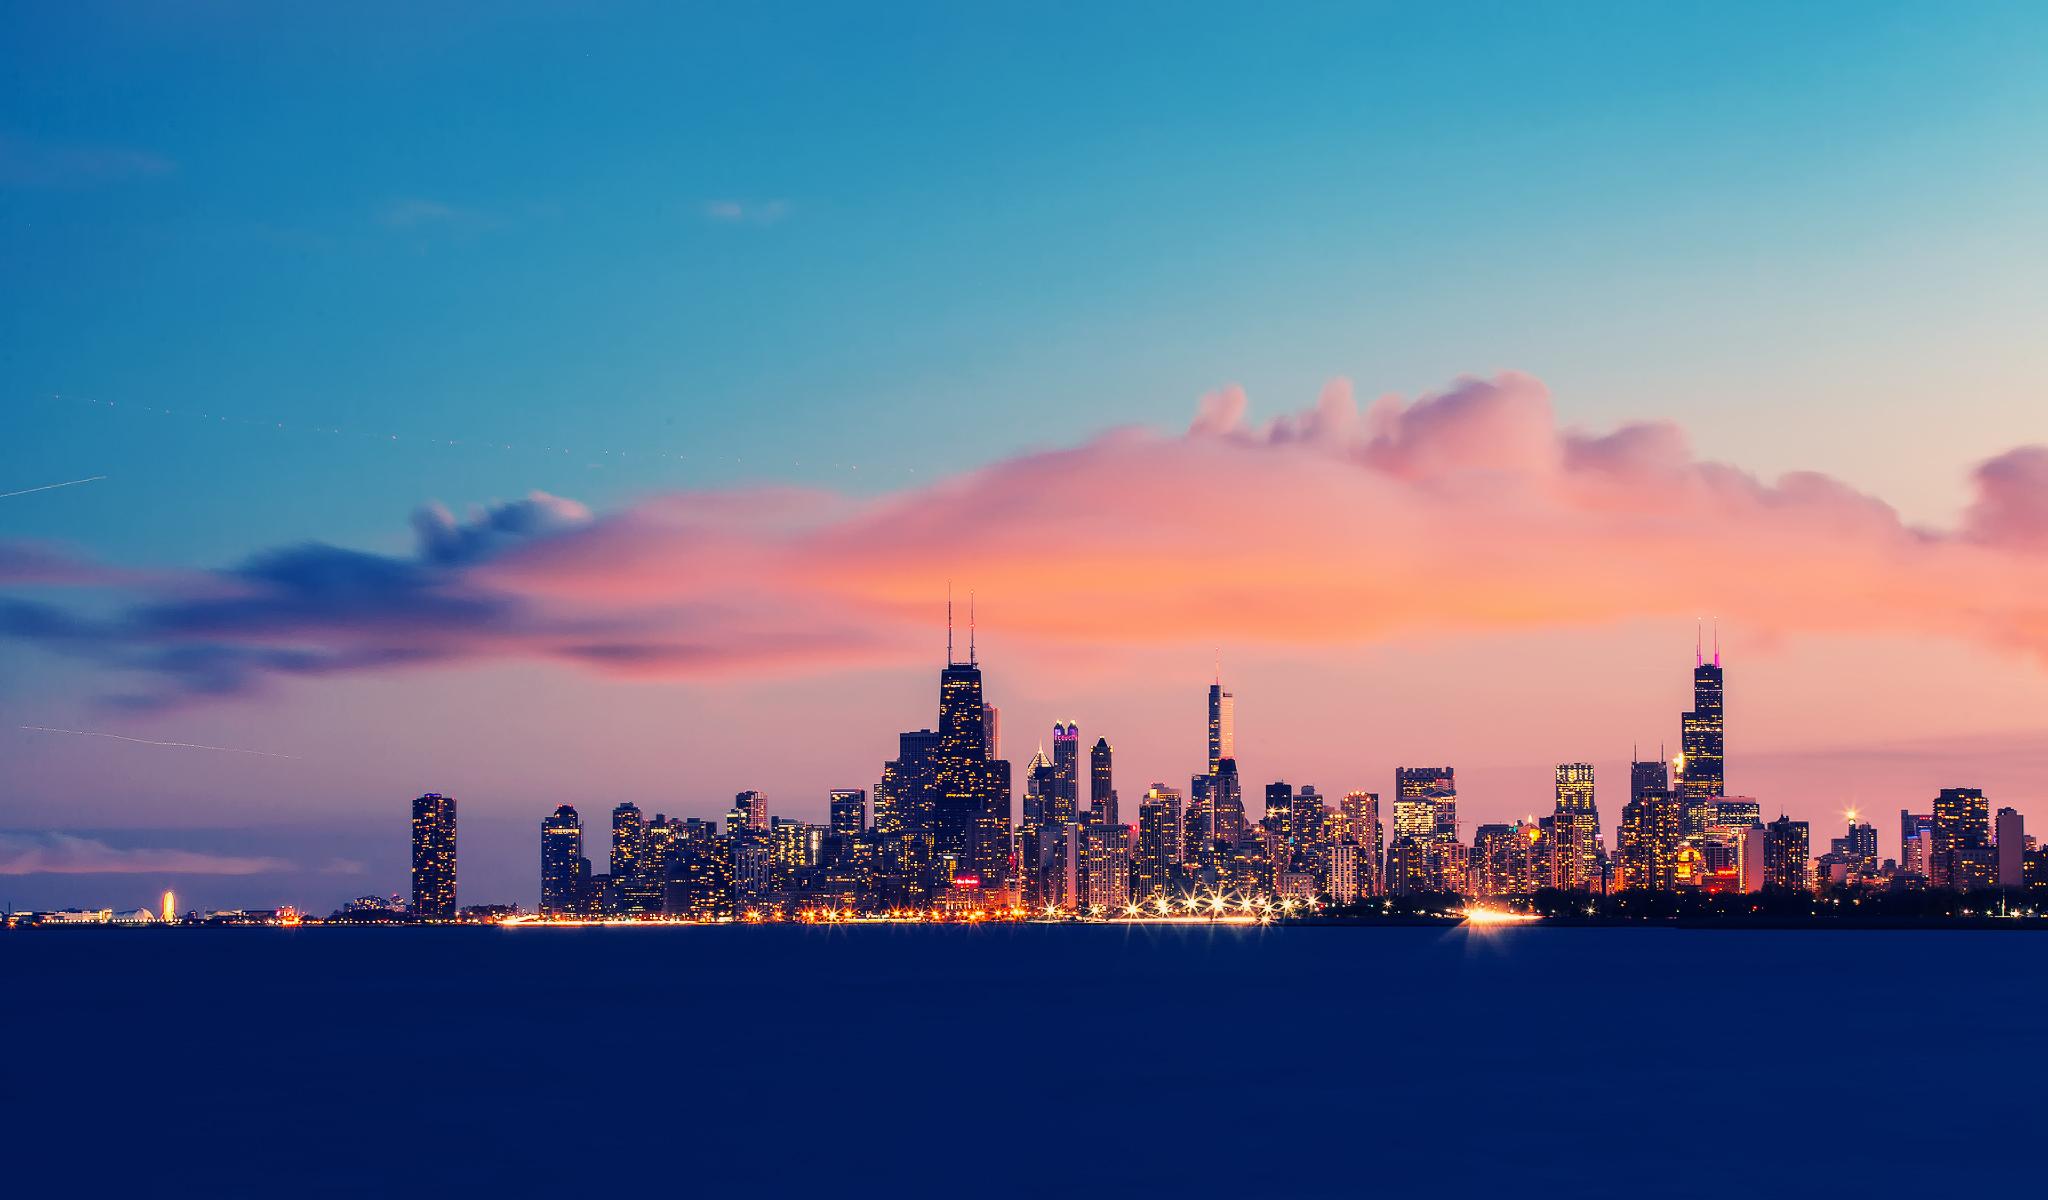 USA Illinois Chicago Lake Michigan endurance evening 2048x1200